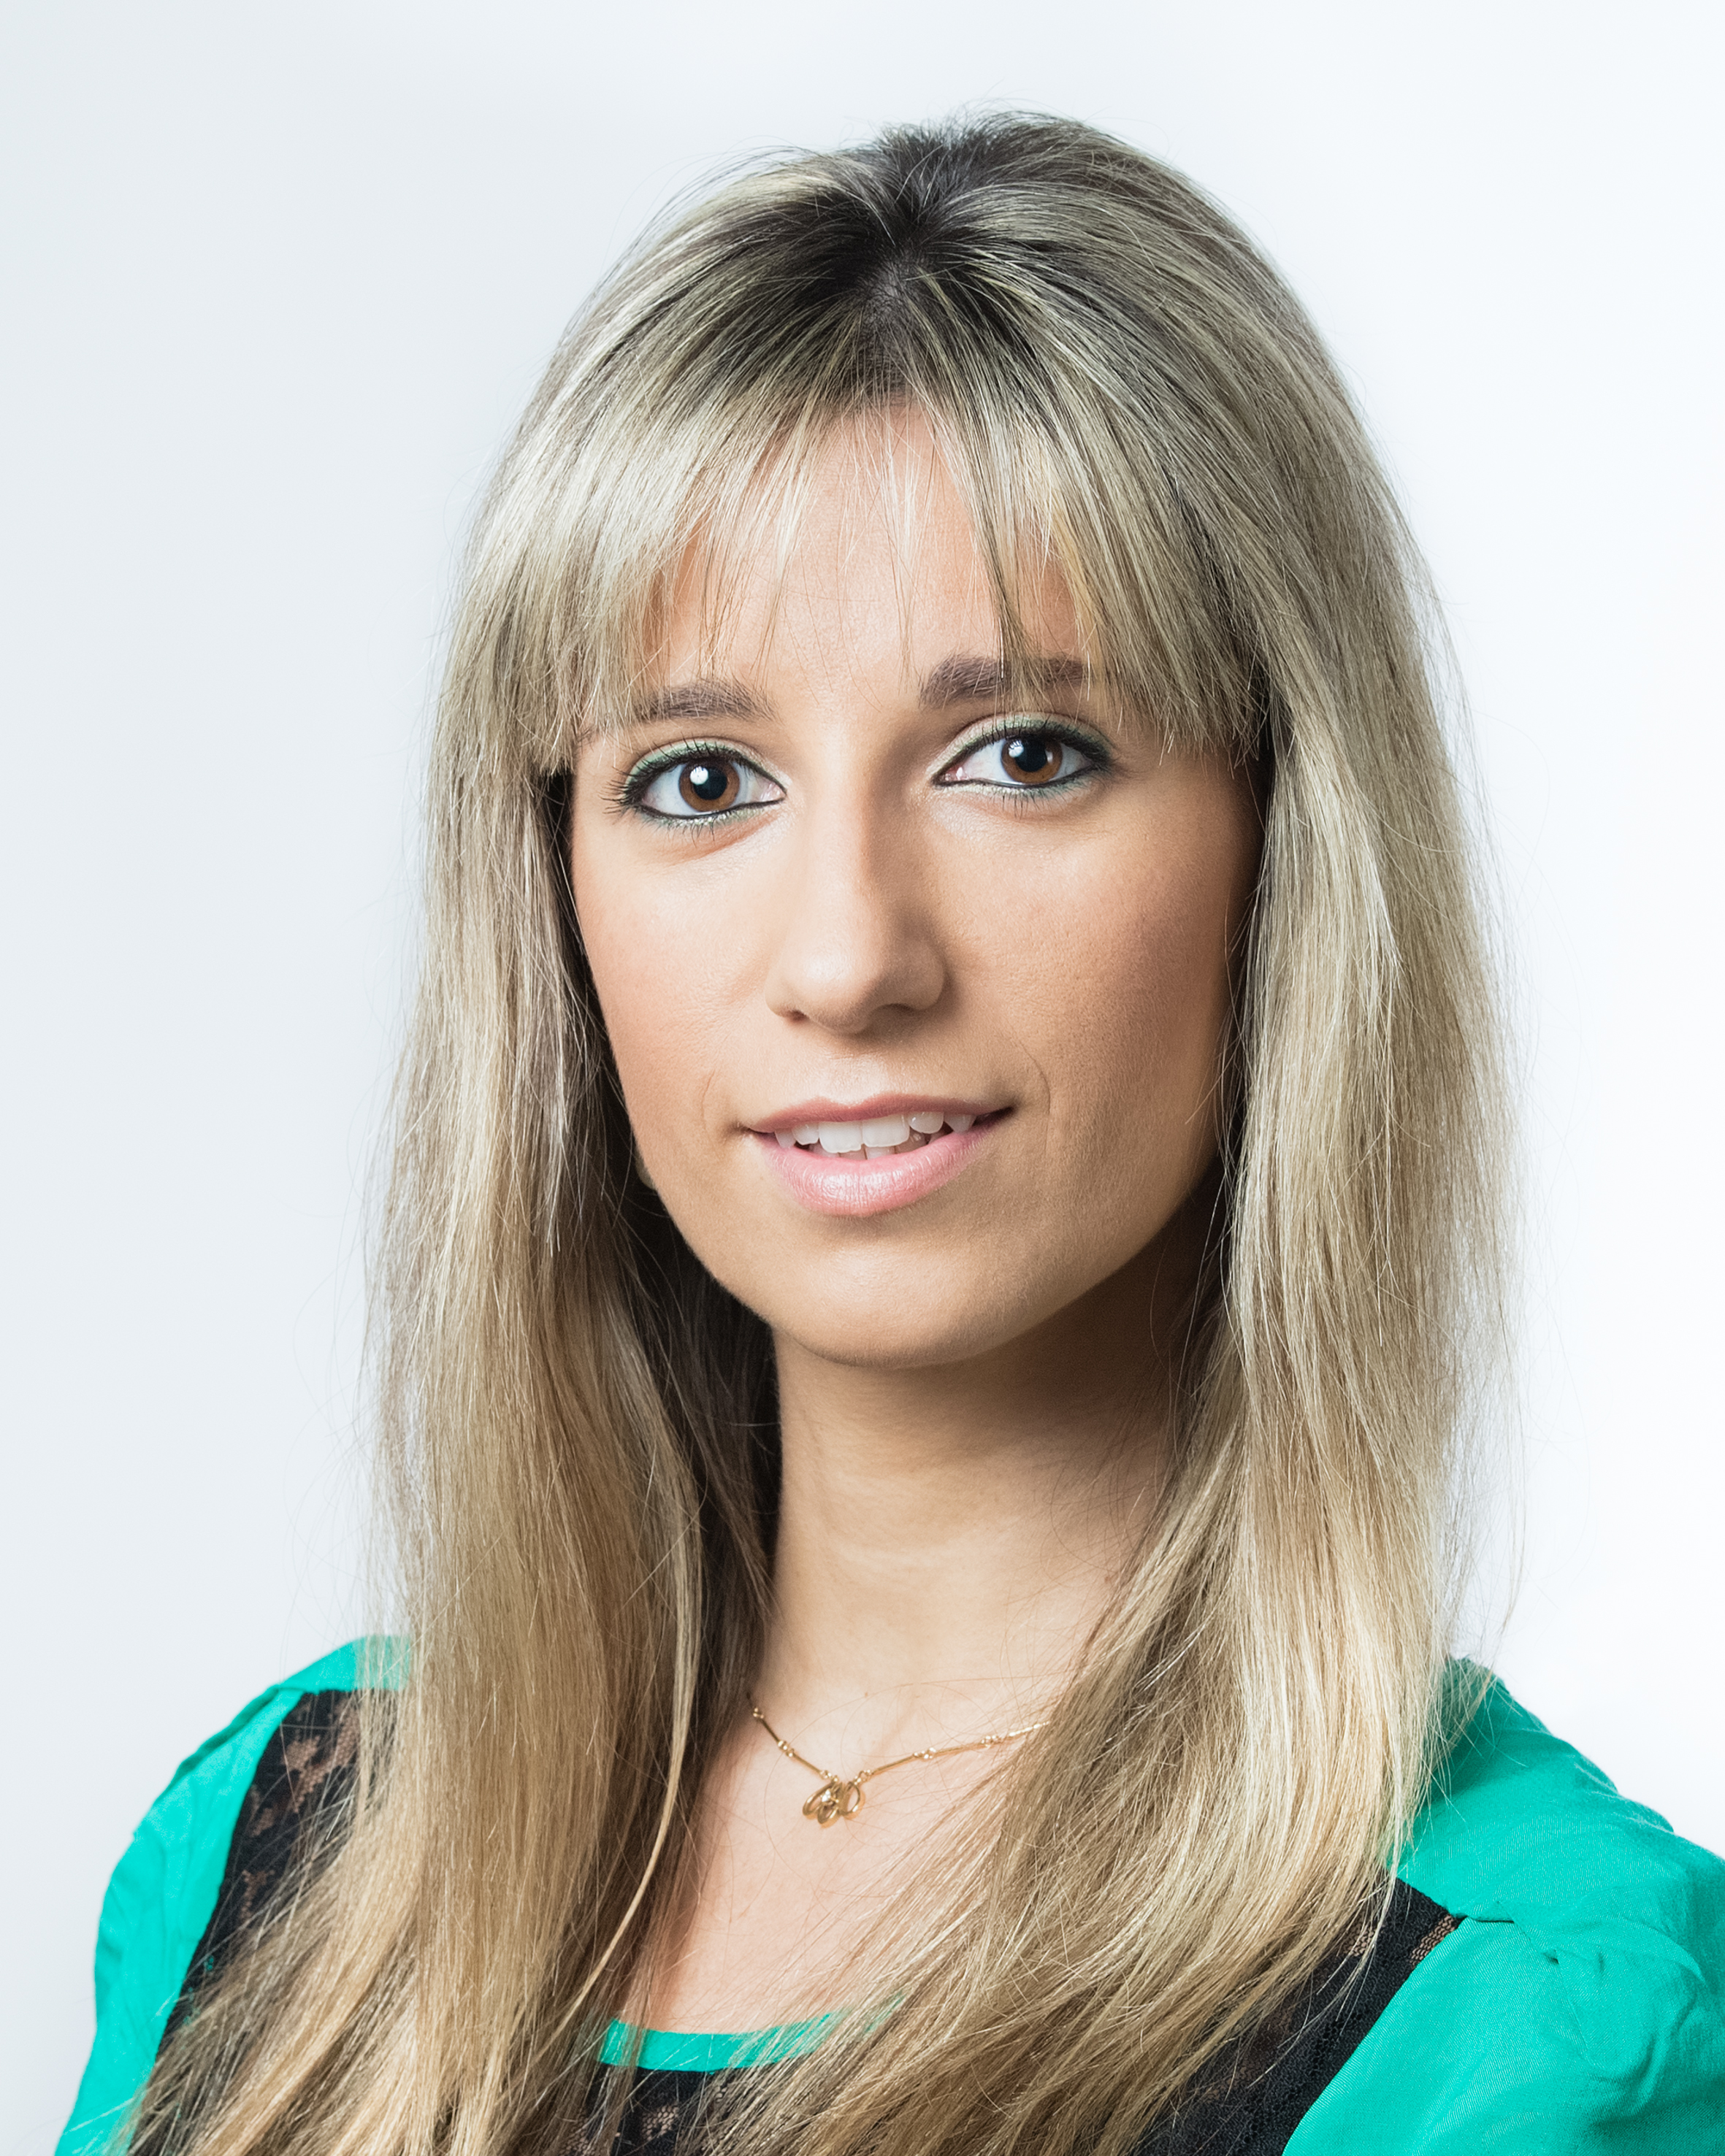 Cristina Cabanillas